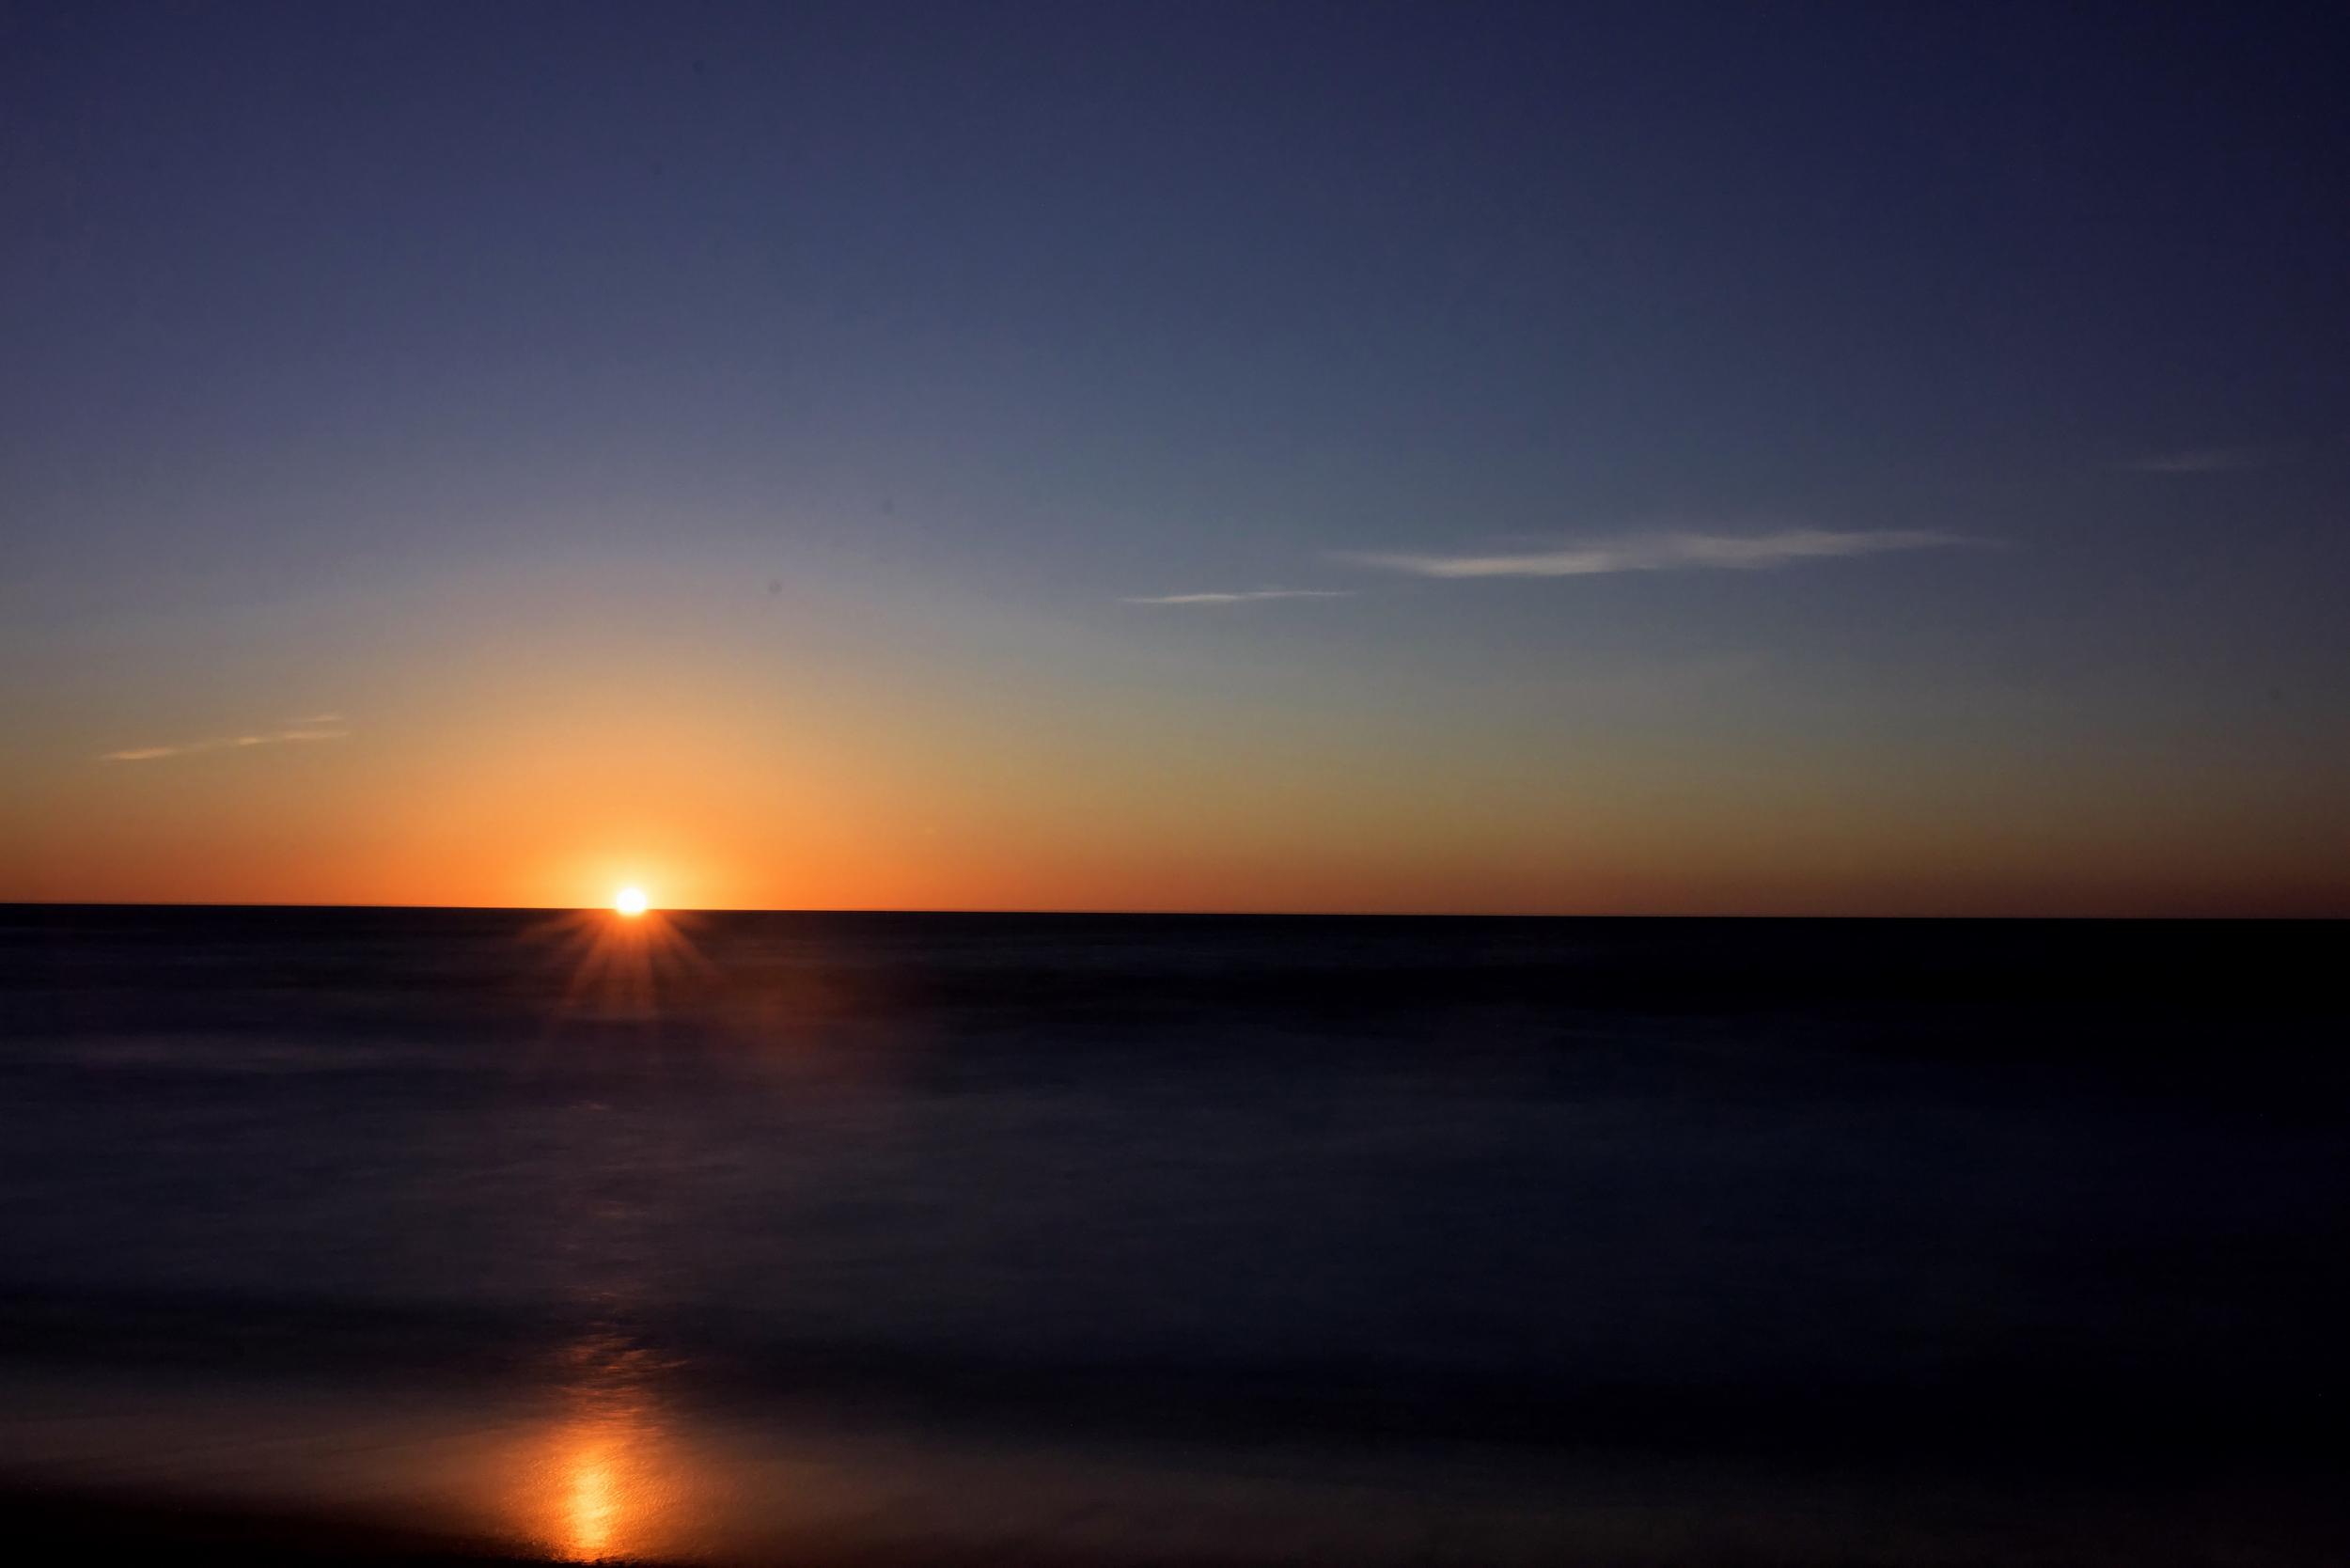 SUNSET-4735.jpg